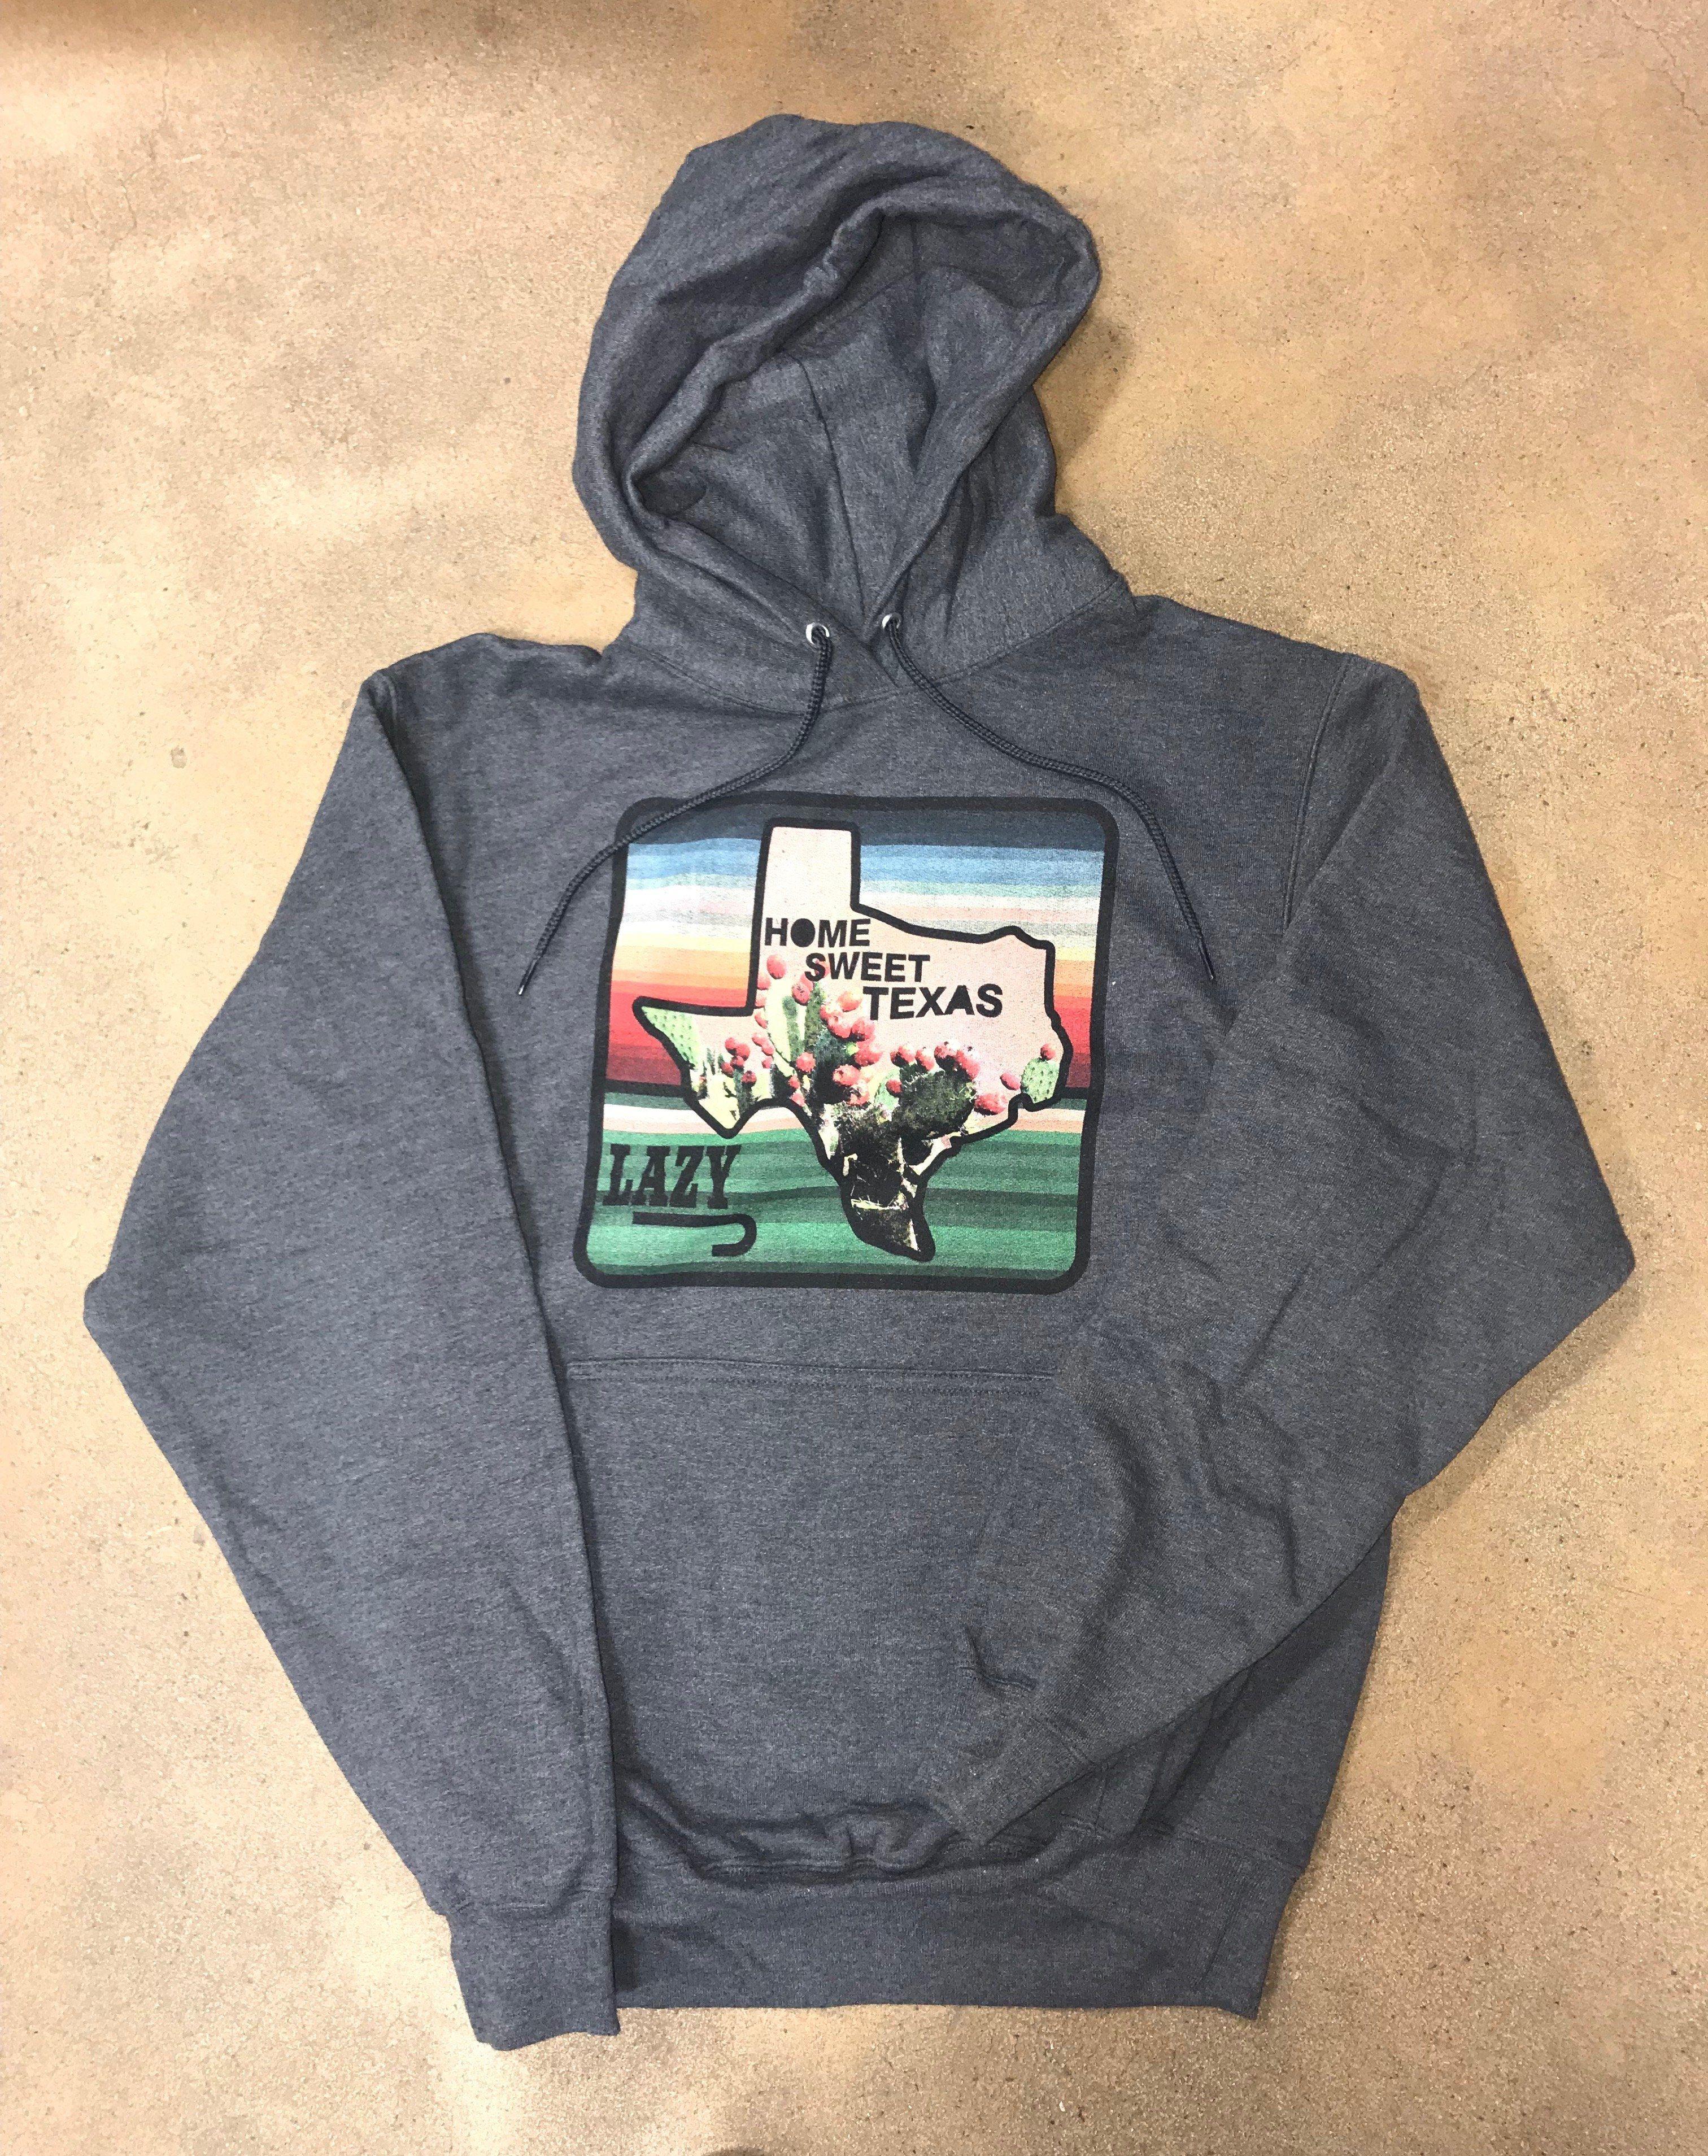 Heather Charcoal Hoodies Sweatshirts Hoodie Cute Country Outfits [ 3817 x 3024 Pixel ]